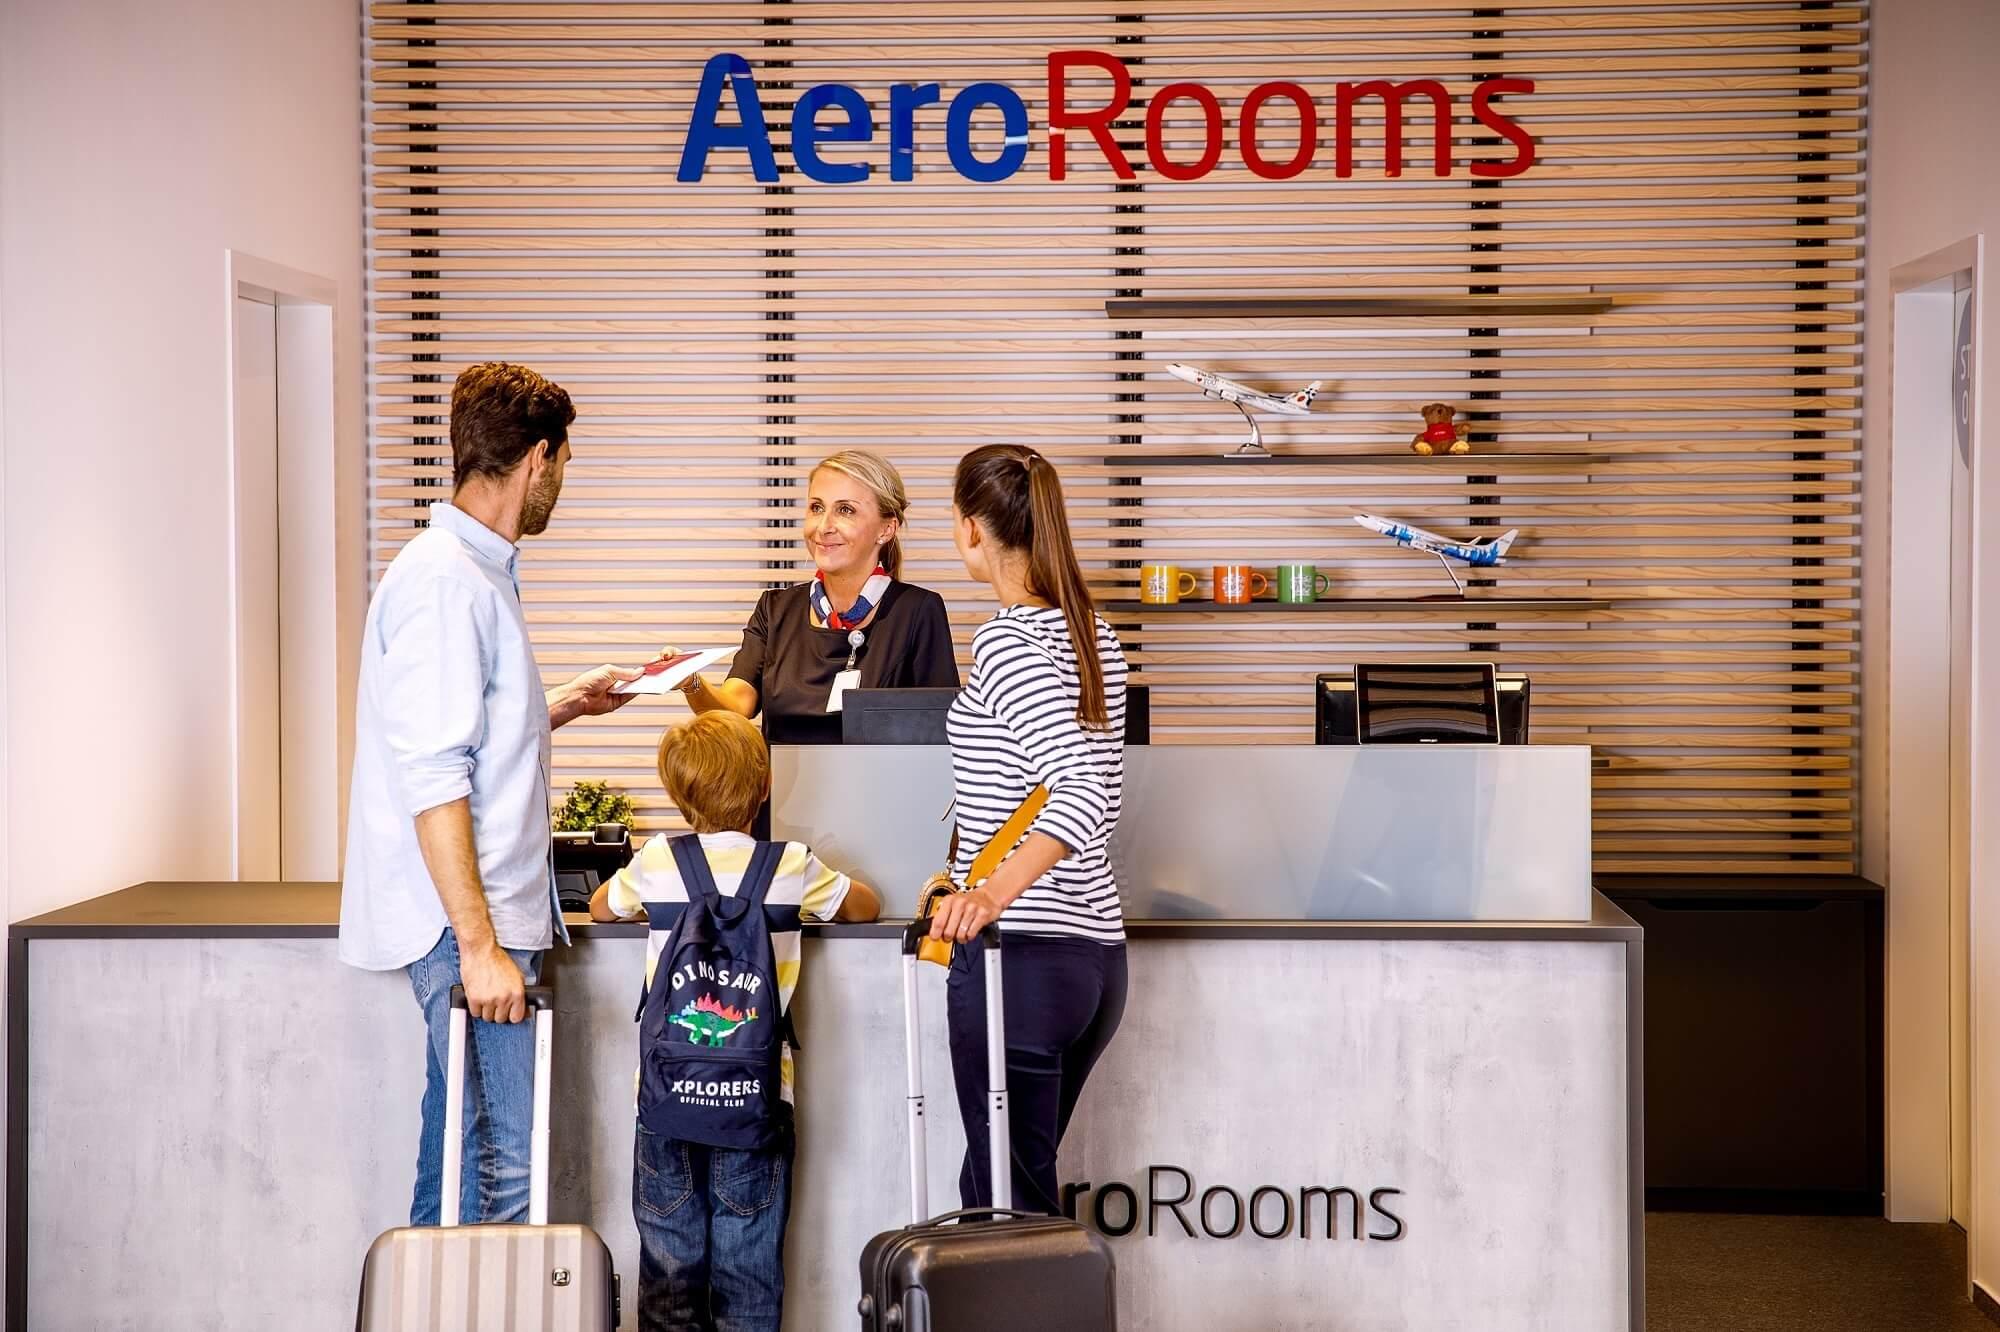 Prague Airport opens AeroRooms Hotel behind passport control